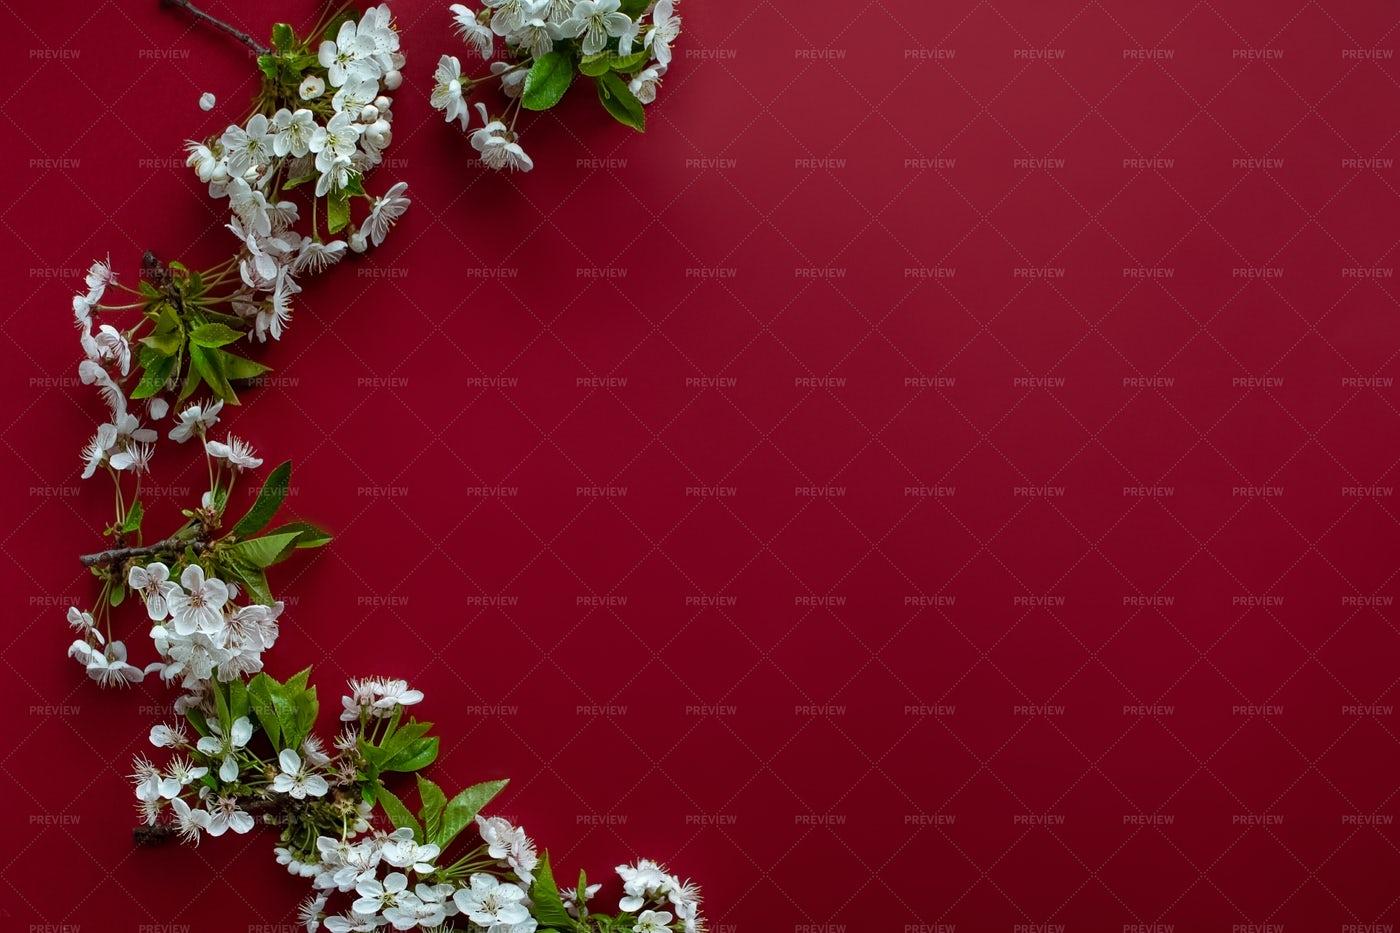 Arrangement Of Cherry Tree Blossoms: Stock Photos